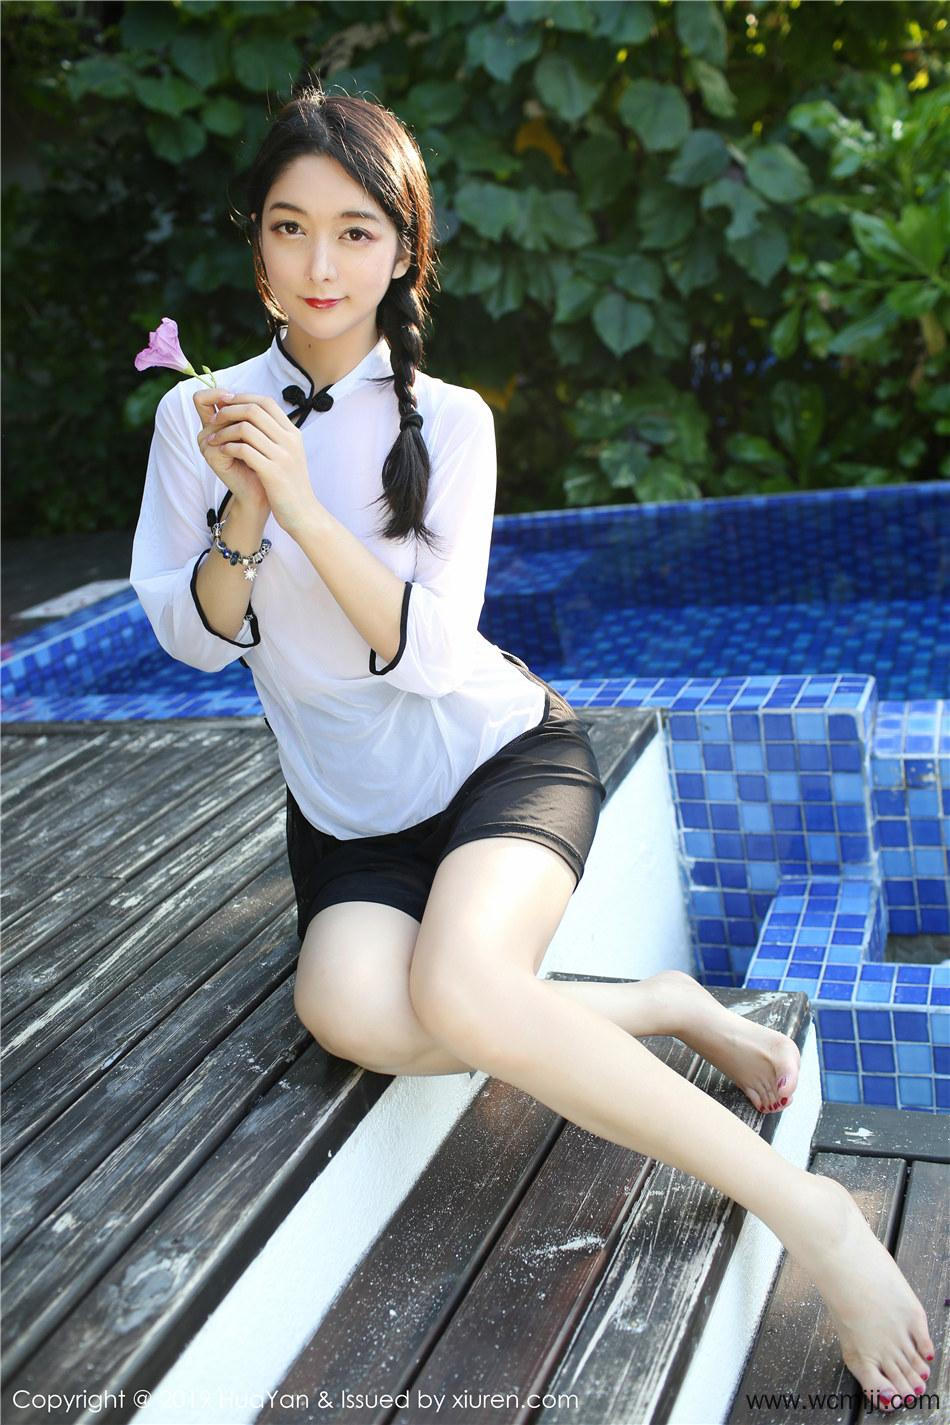 【花の颜】【Angela】小清新美女Angela性感私拍图片 Vol.065【41P】 制服